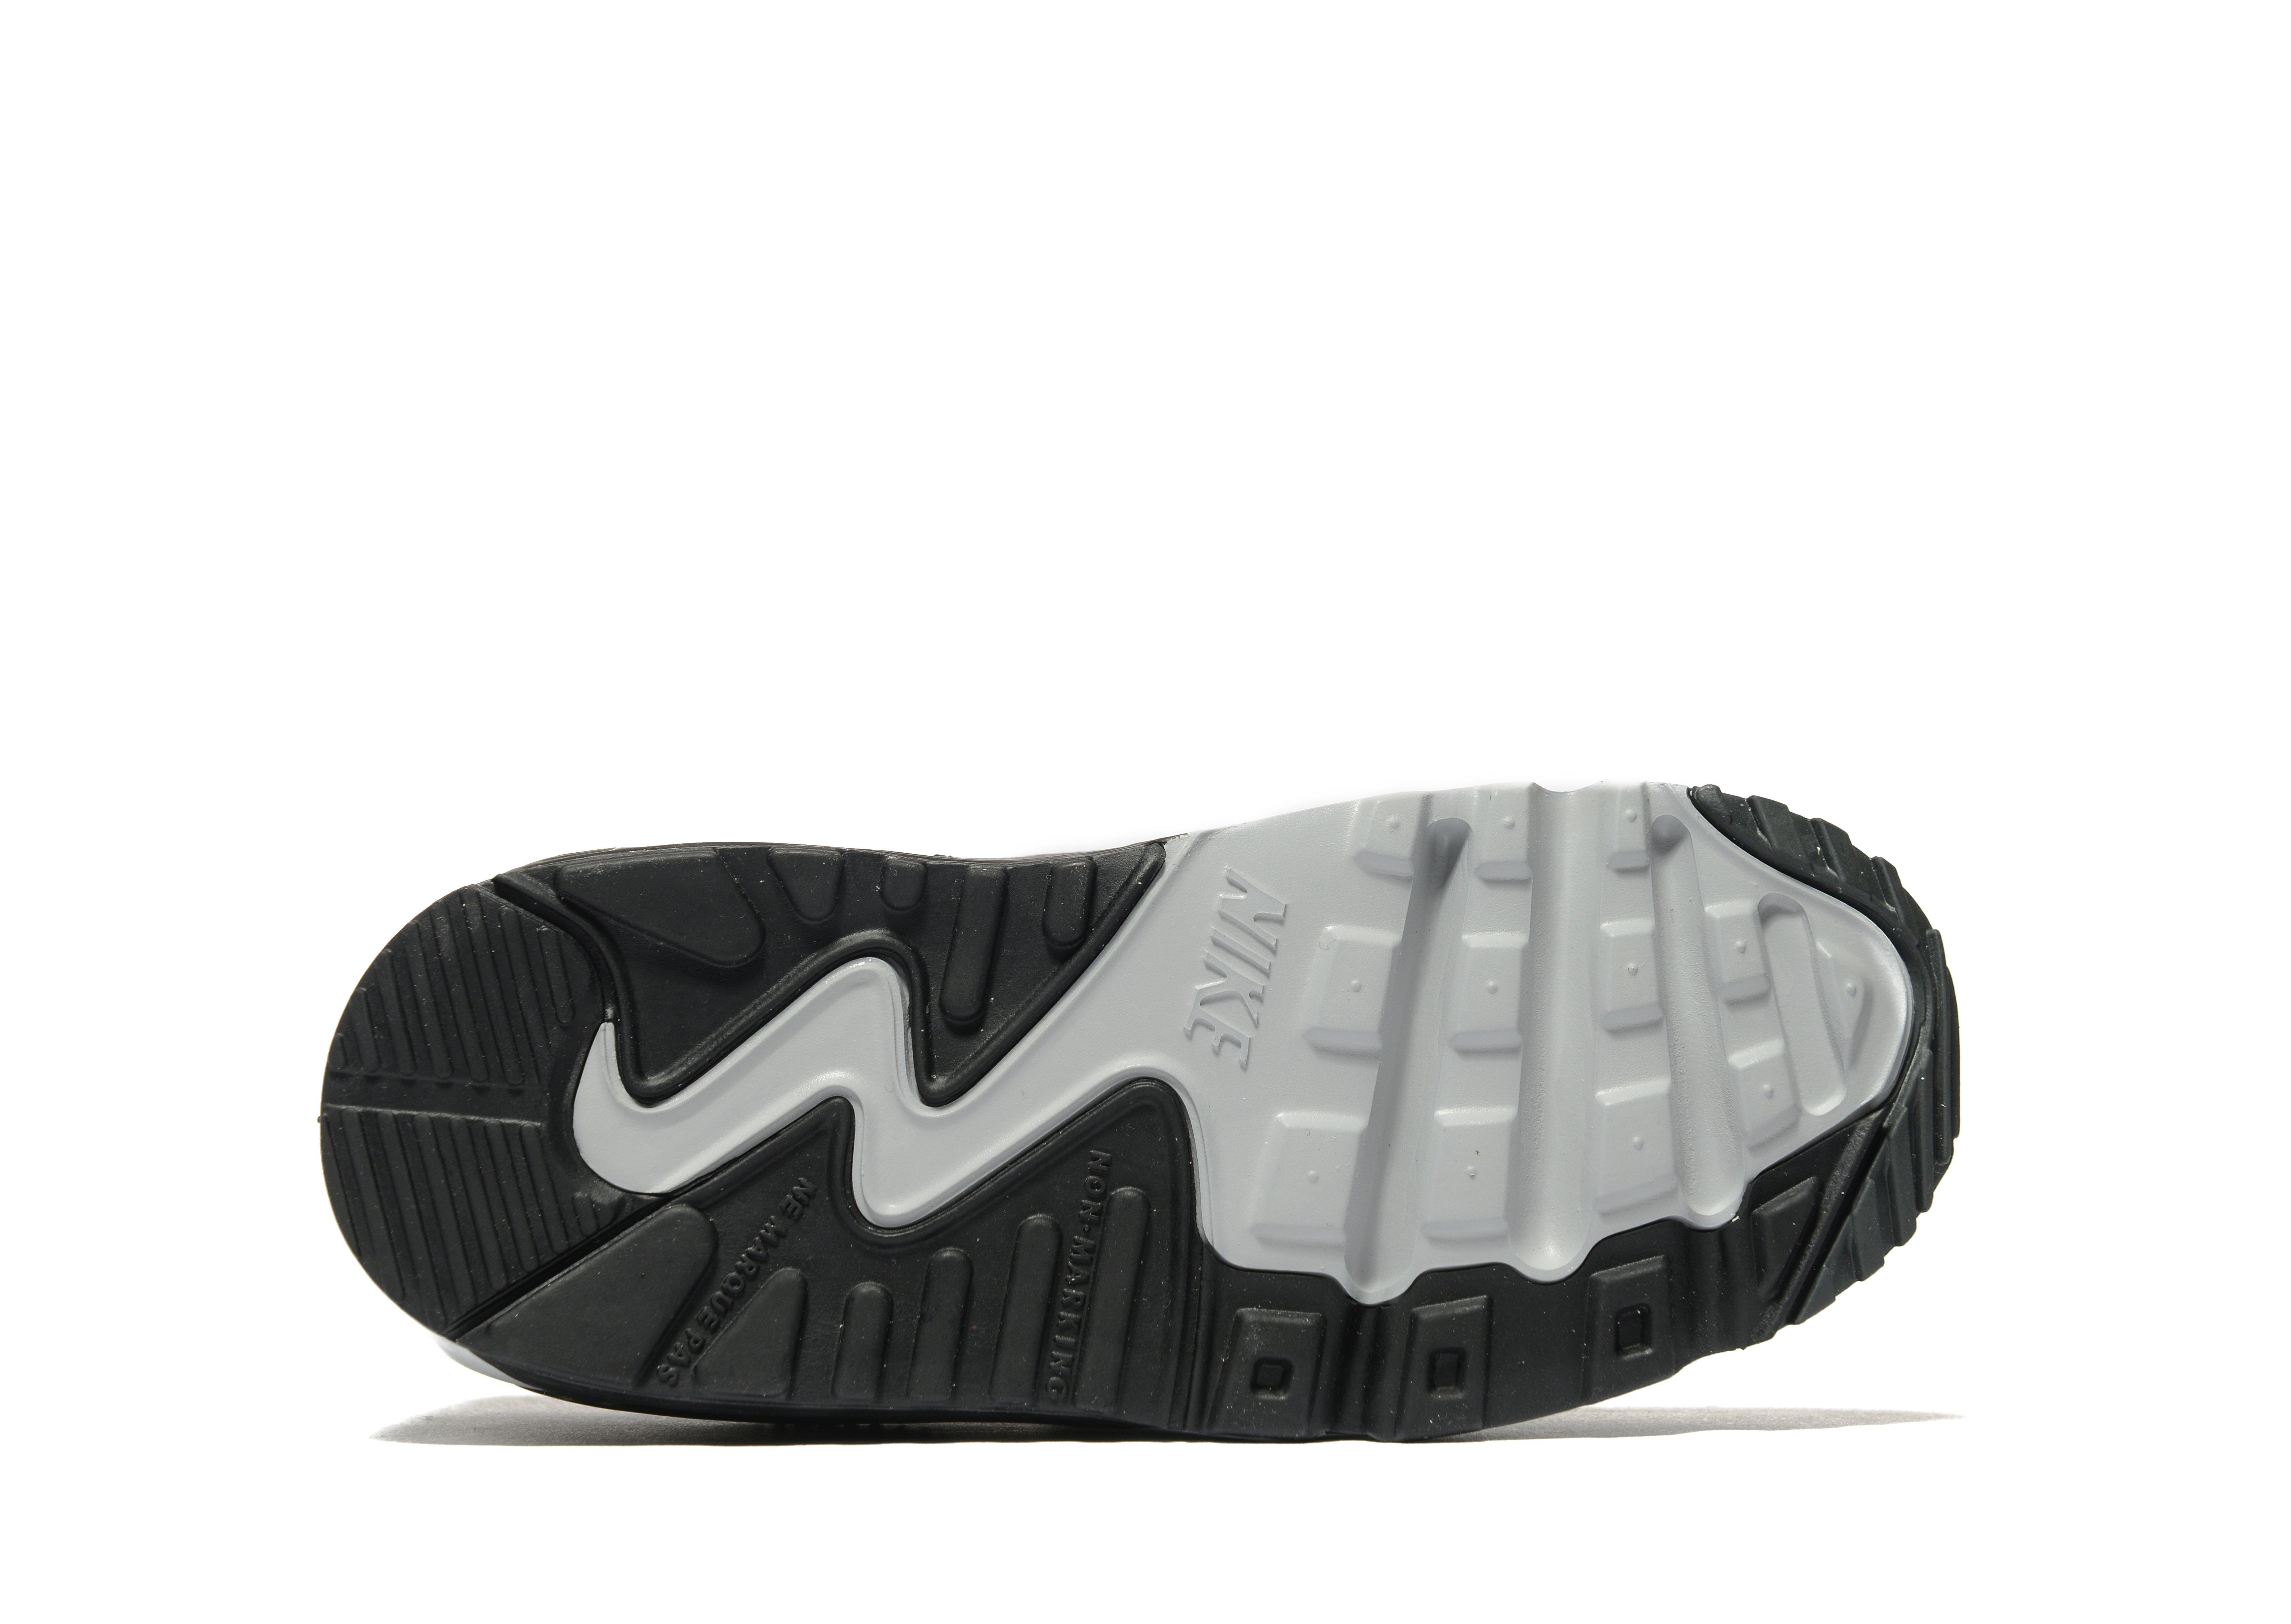 b132b07e2 Nike Roshe Pink Wedge Sneakers Target